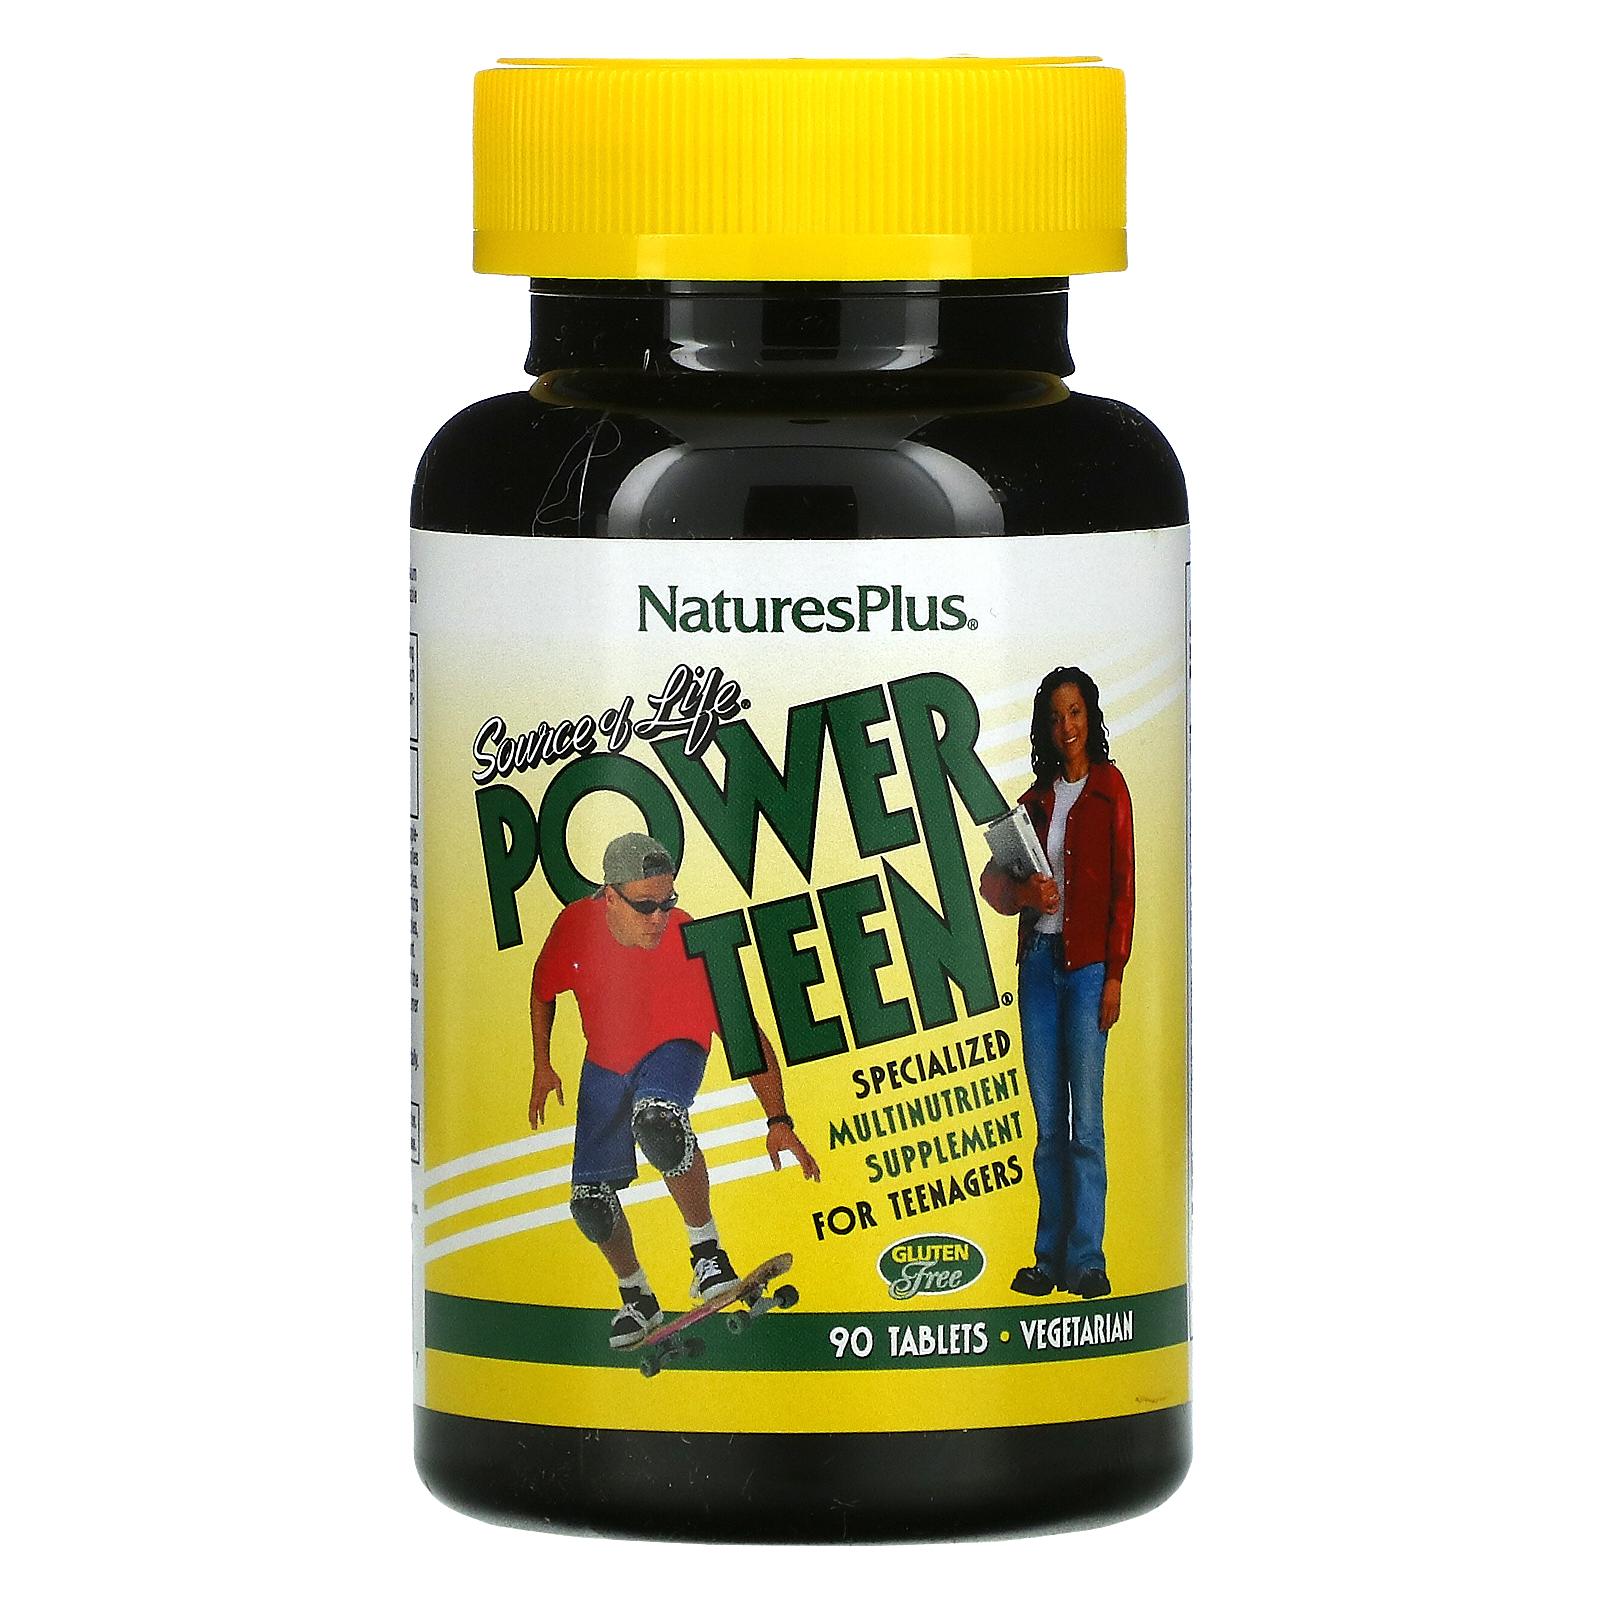 Source of Life Power Teen